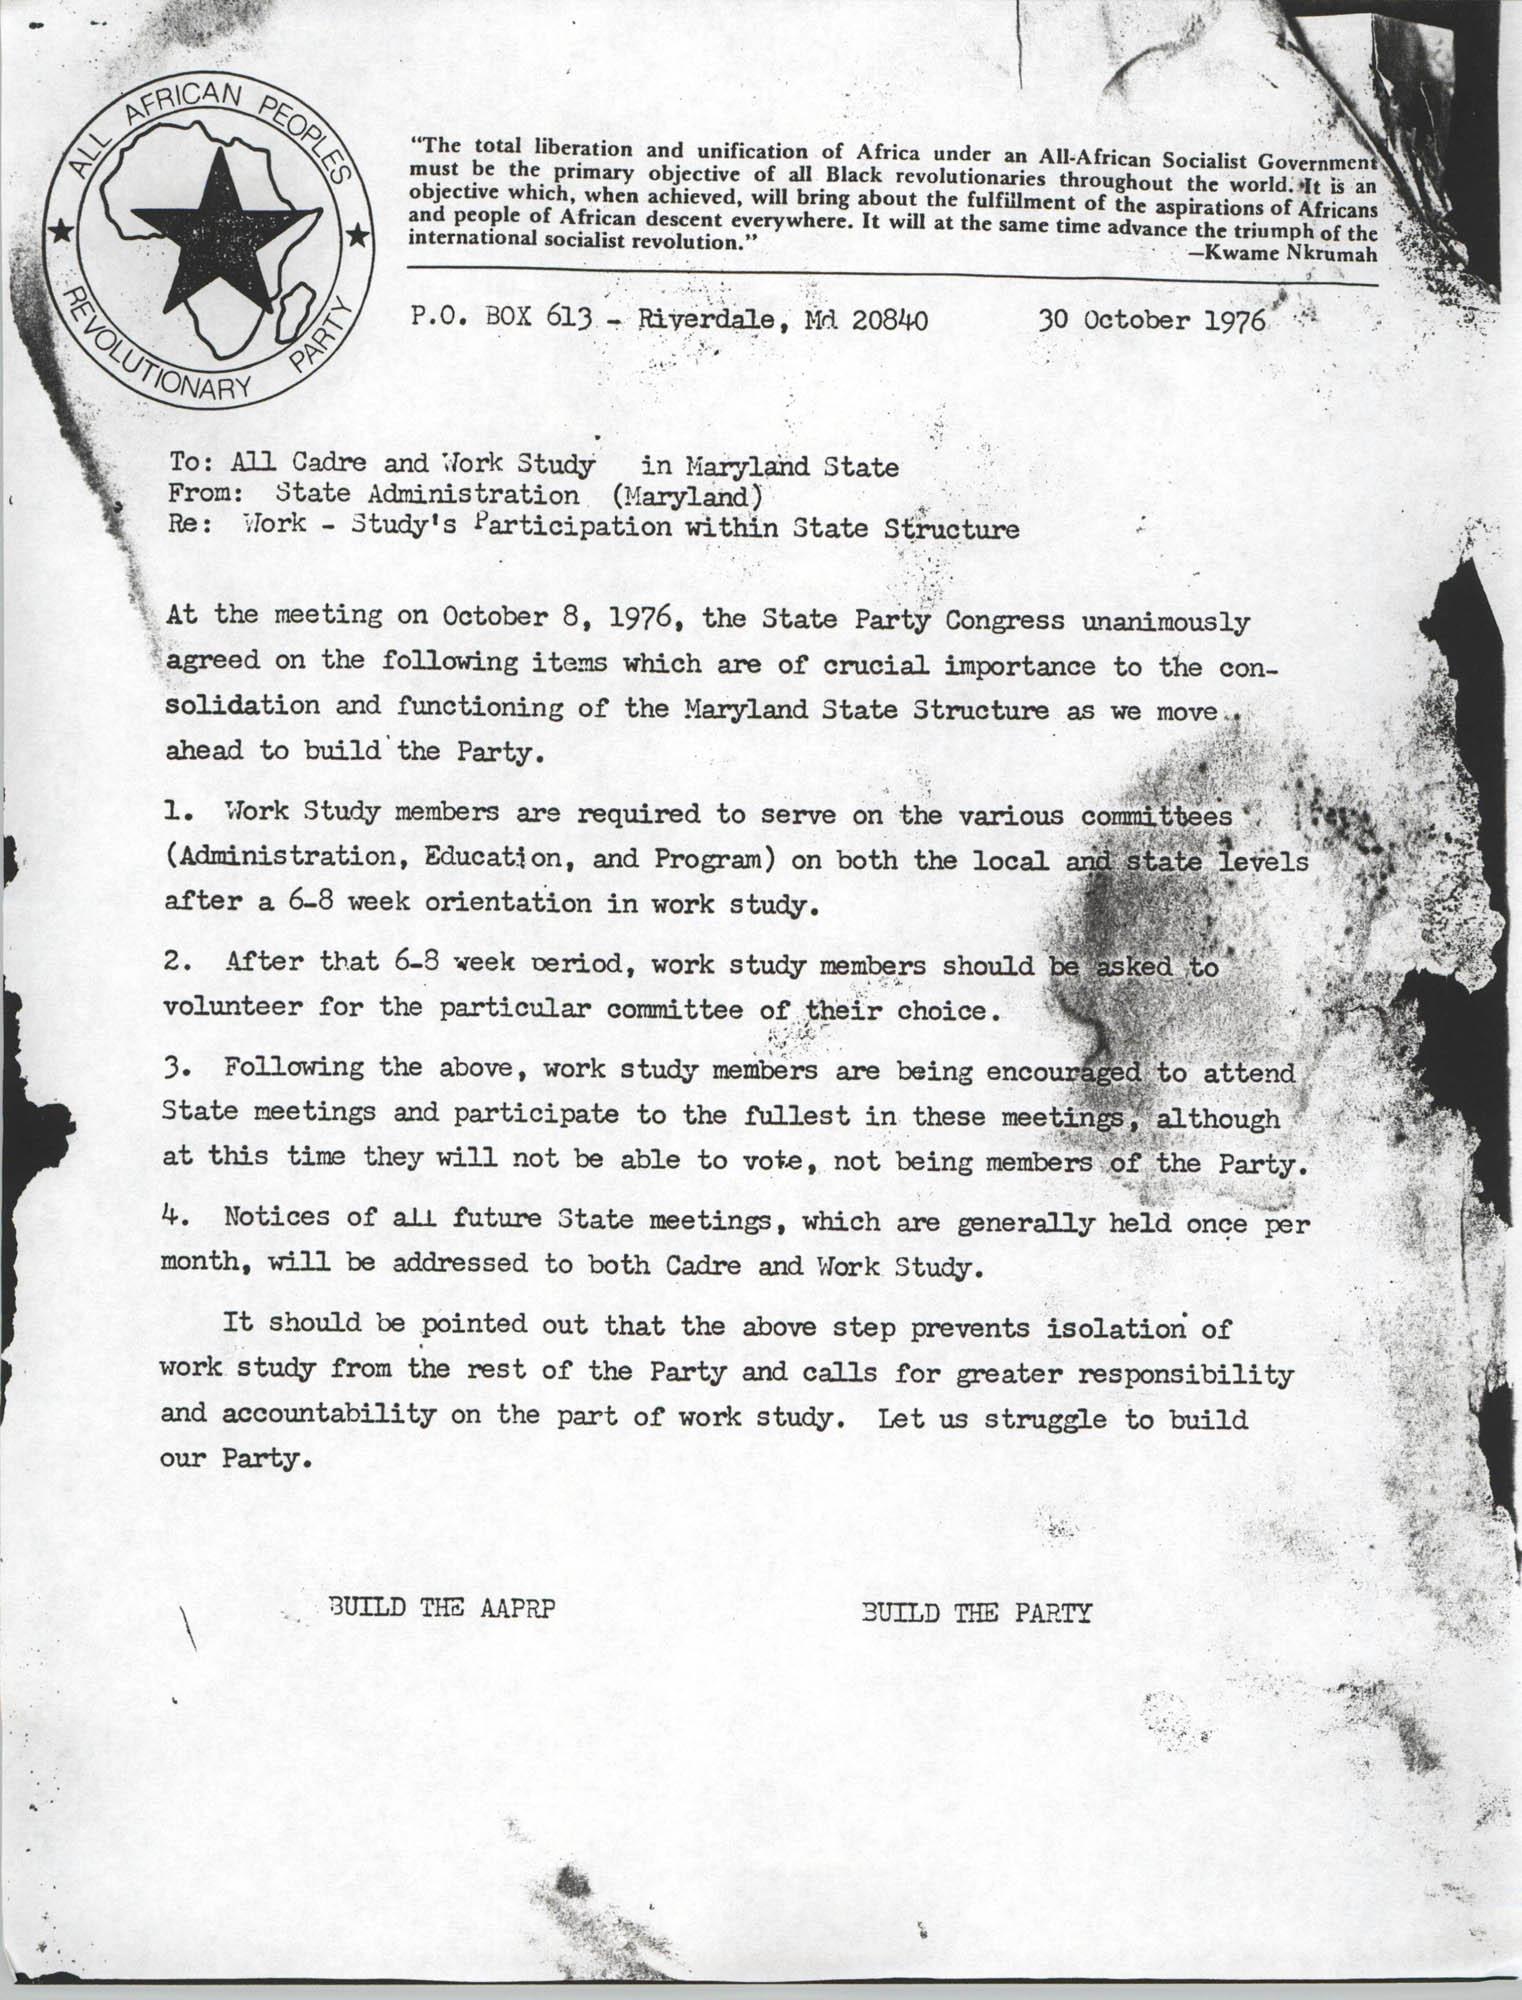 All African People's Revolutionary Party Memorandum, October 30, 1976